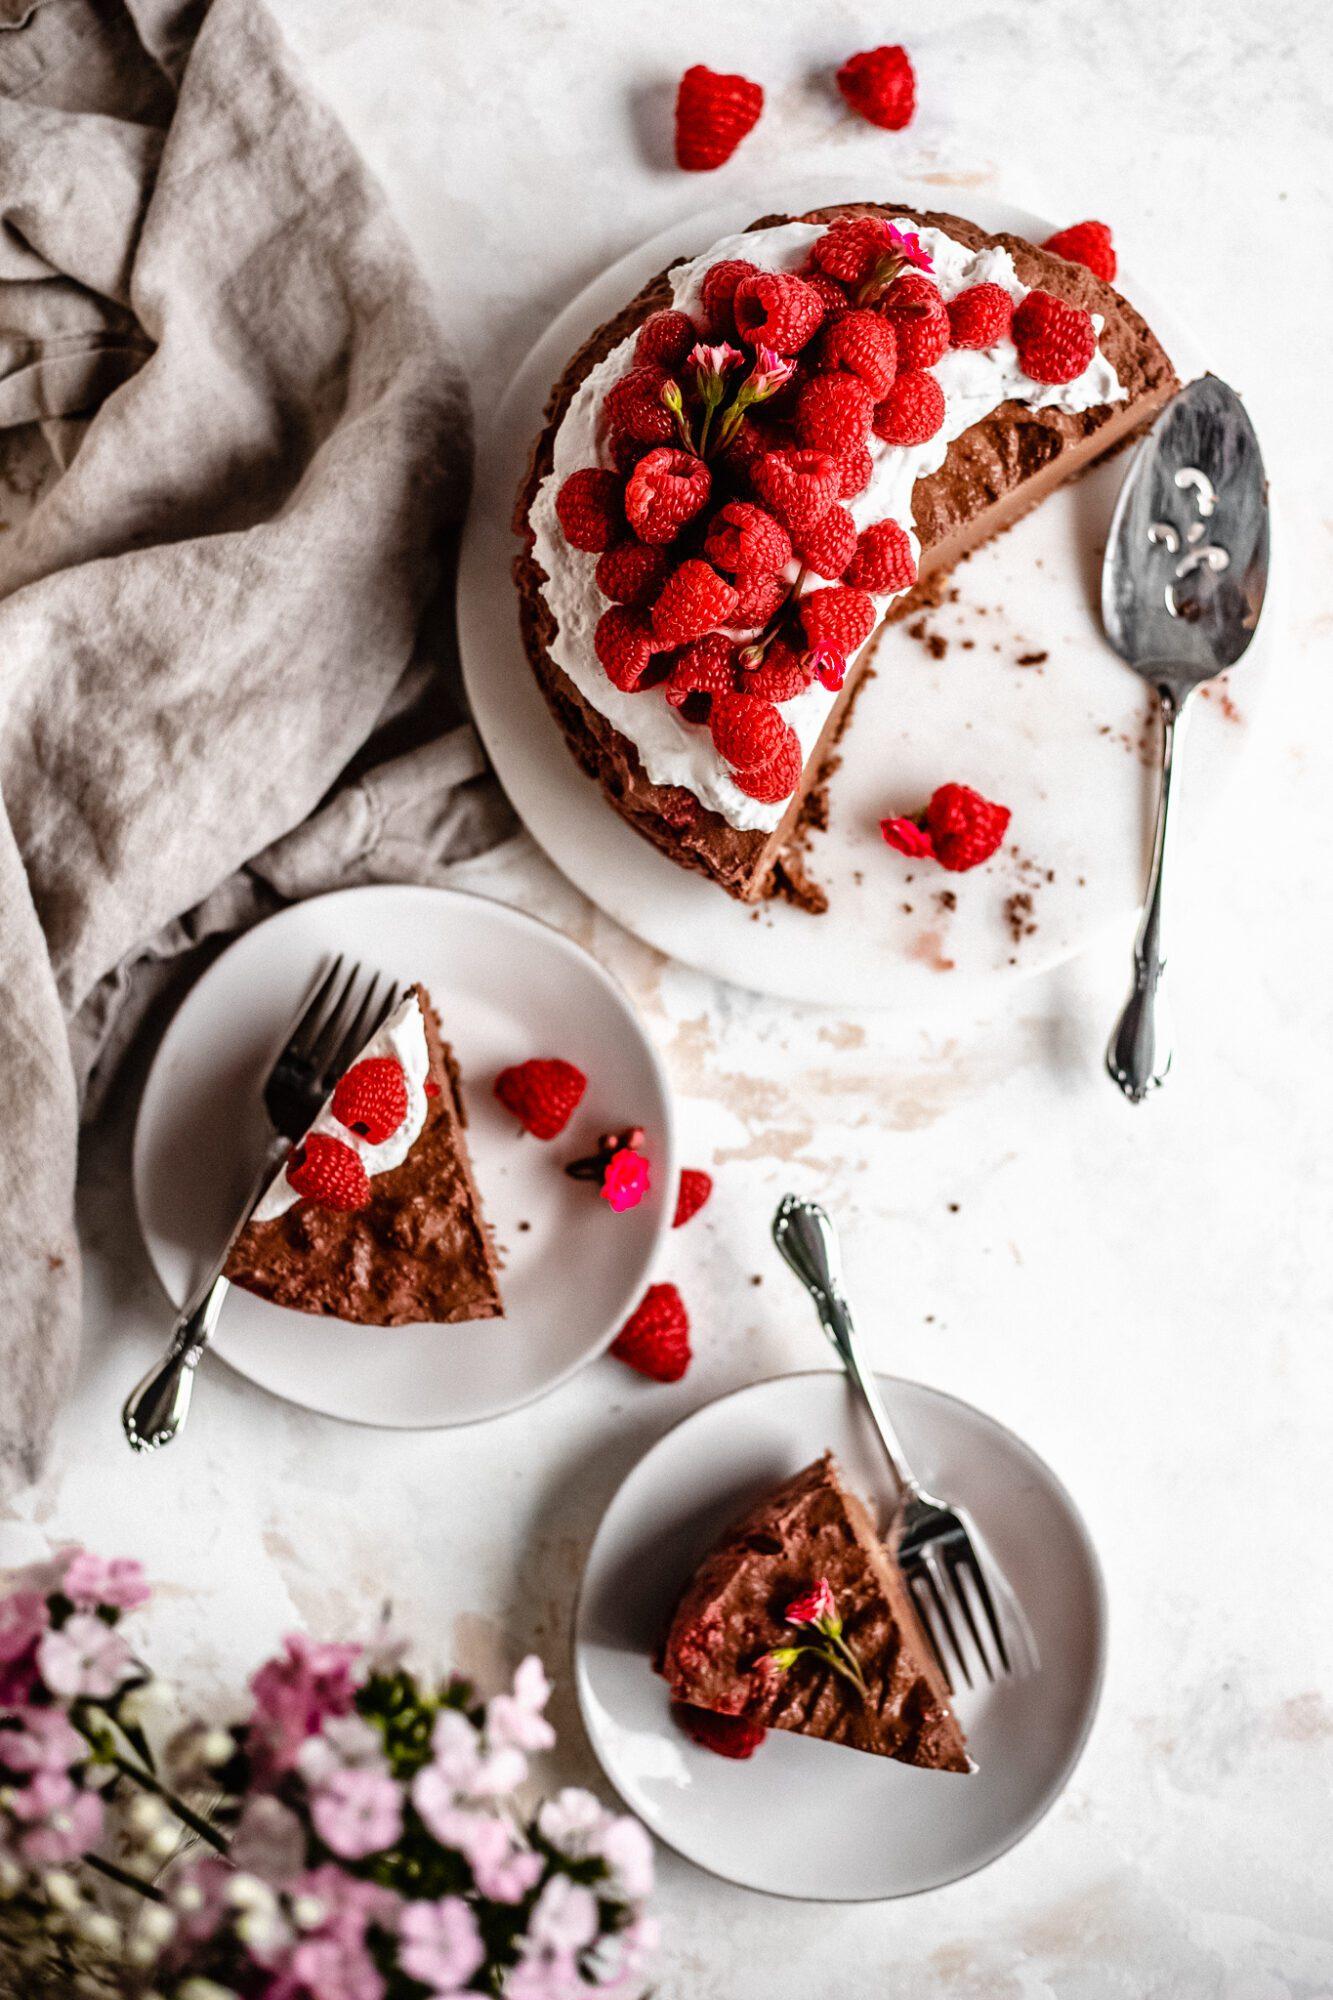 slices of raspberry cheesecake